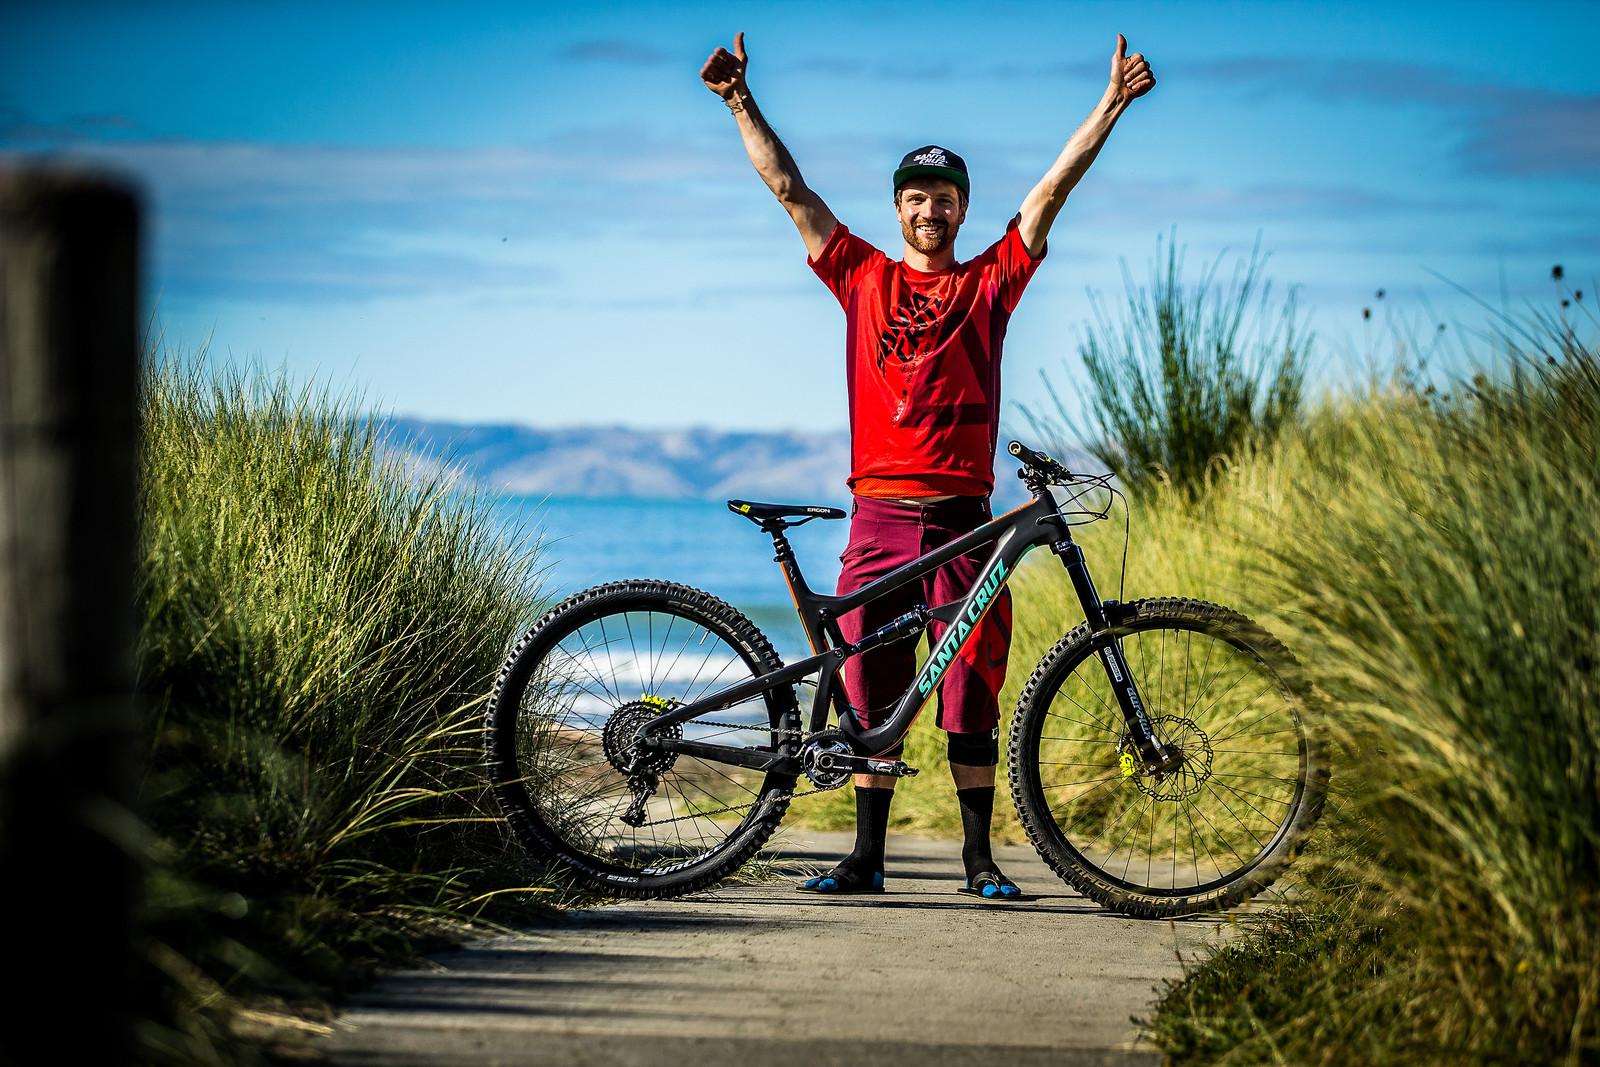 2017 NZ Enduro Pro Bikes - Max Schumann's Santa Cruz Hightower - 2017 NZ Enduro Pro Bikes - They Wreck 'Em, We Check 'Em - Mountain Biking Pictures - Vital MTB